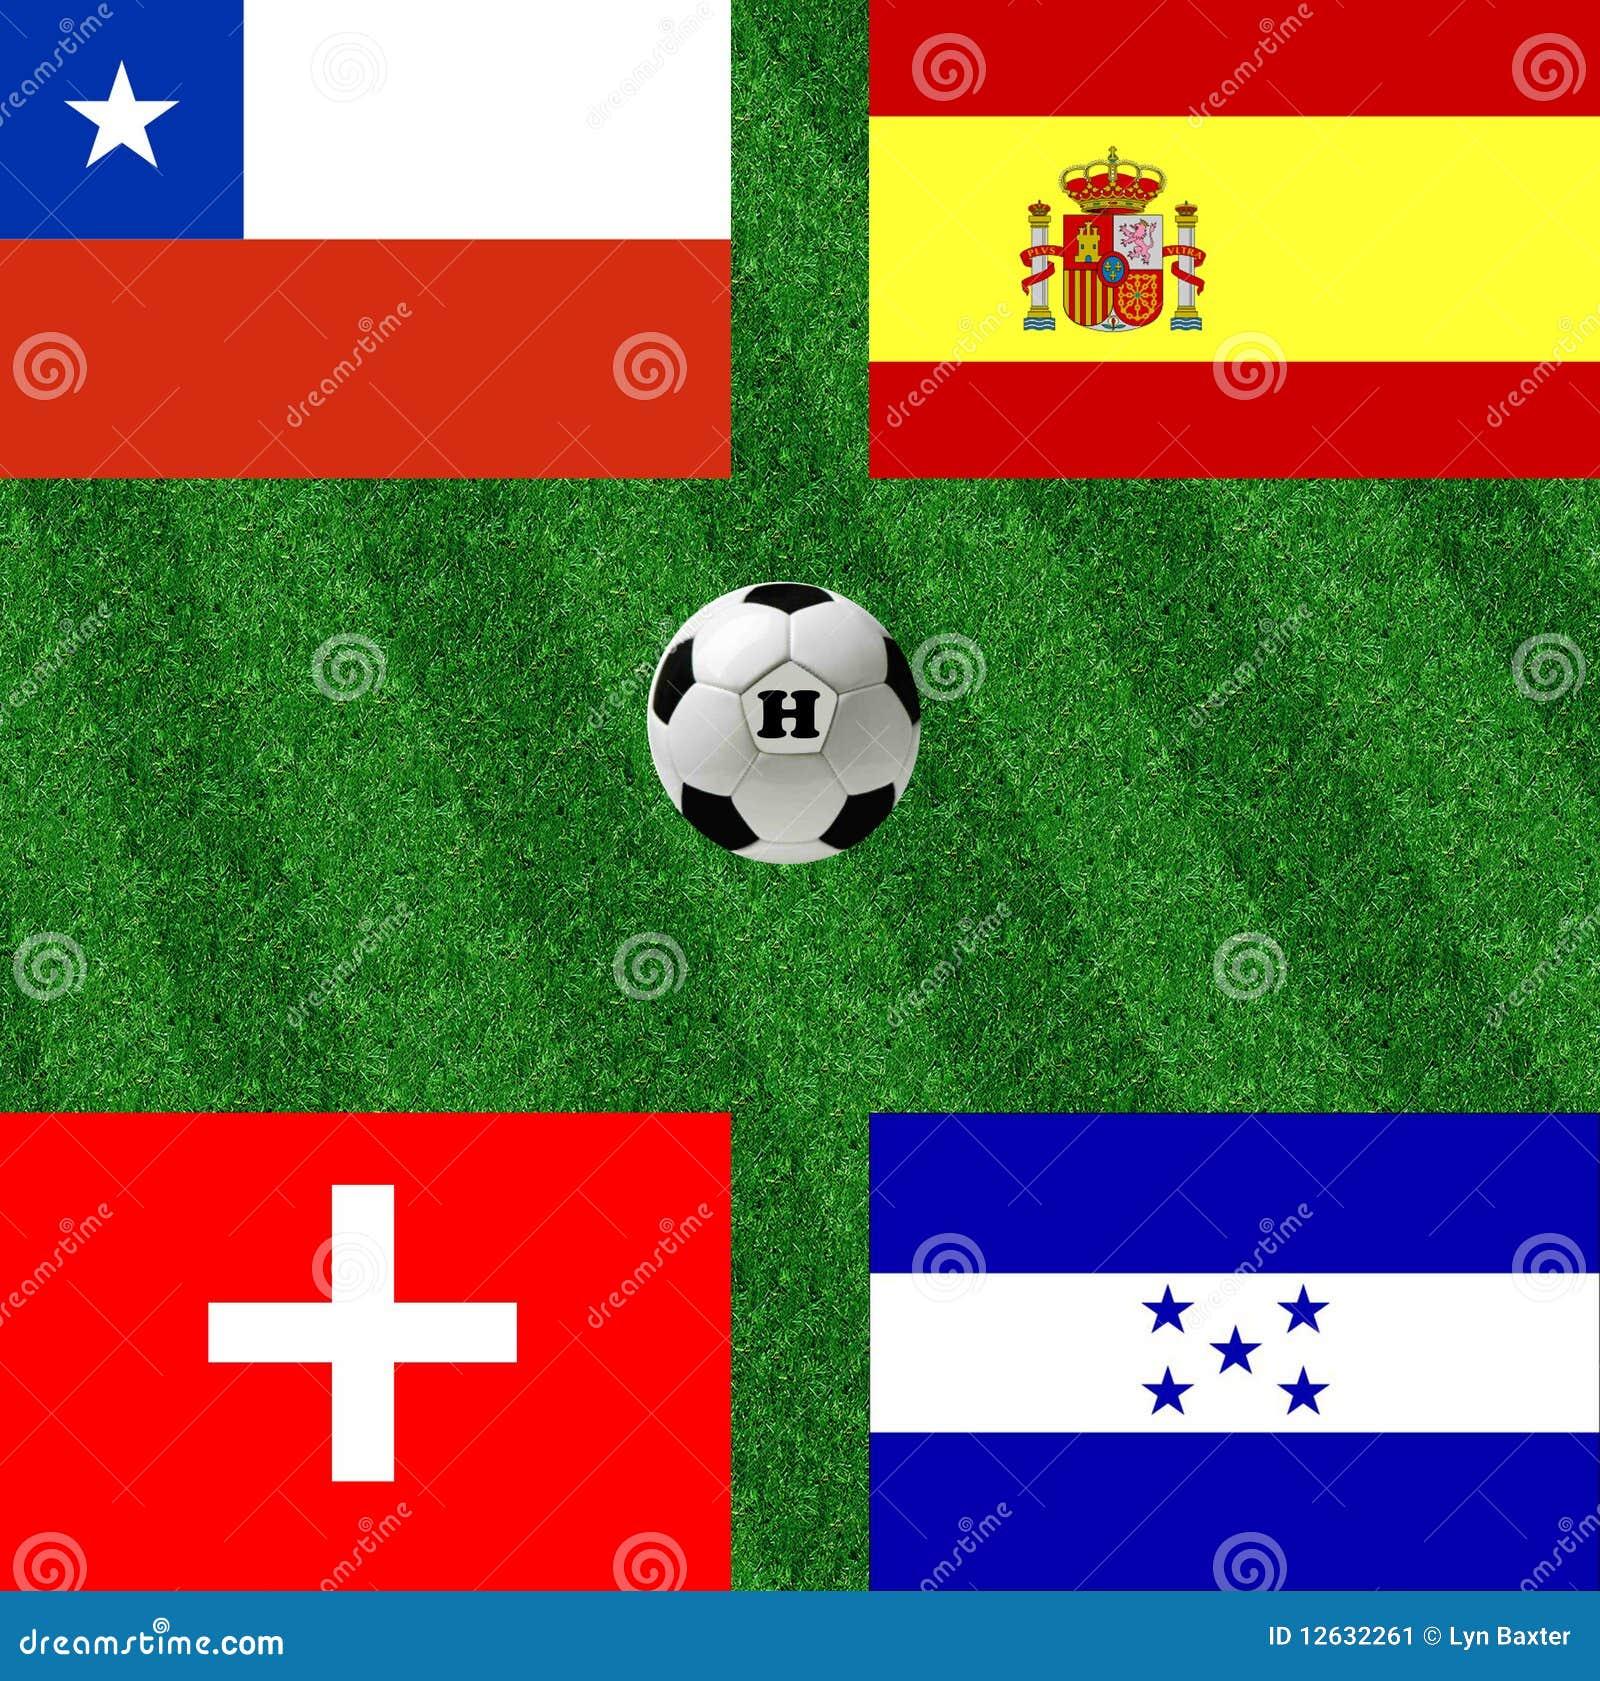 Fútbol de la taza de mundo del grupo H